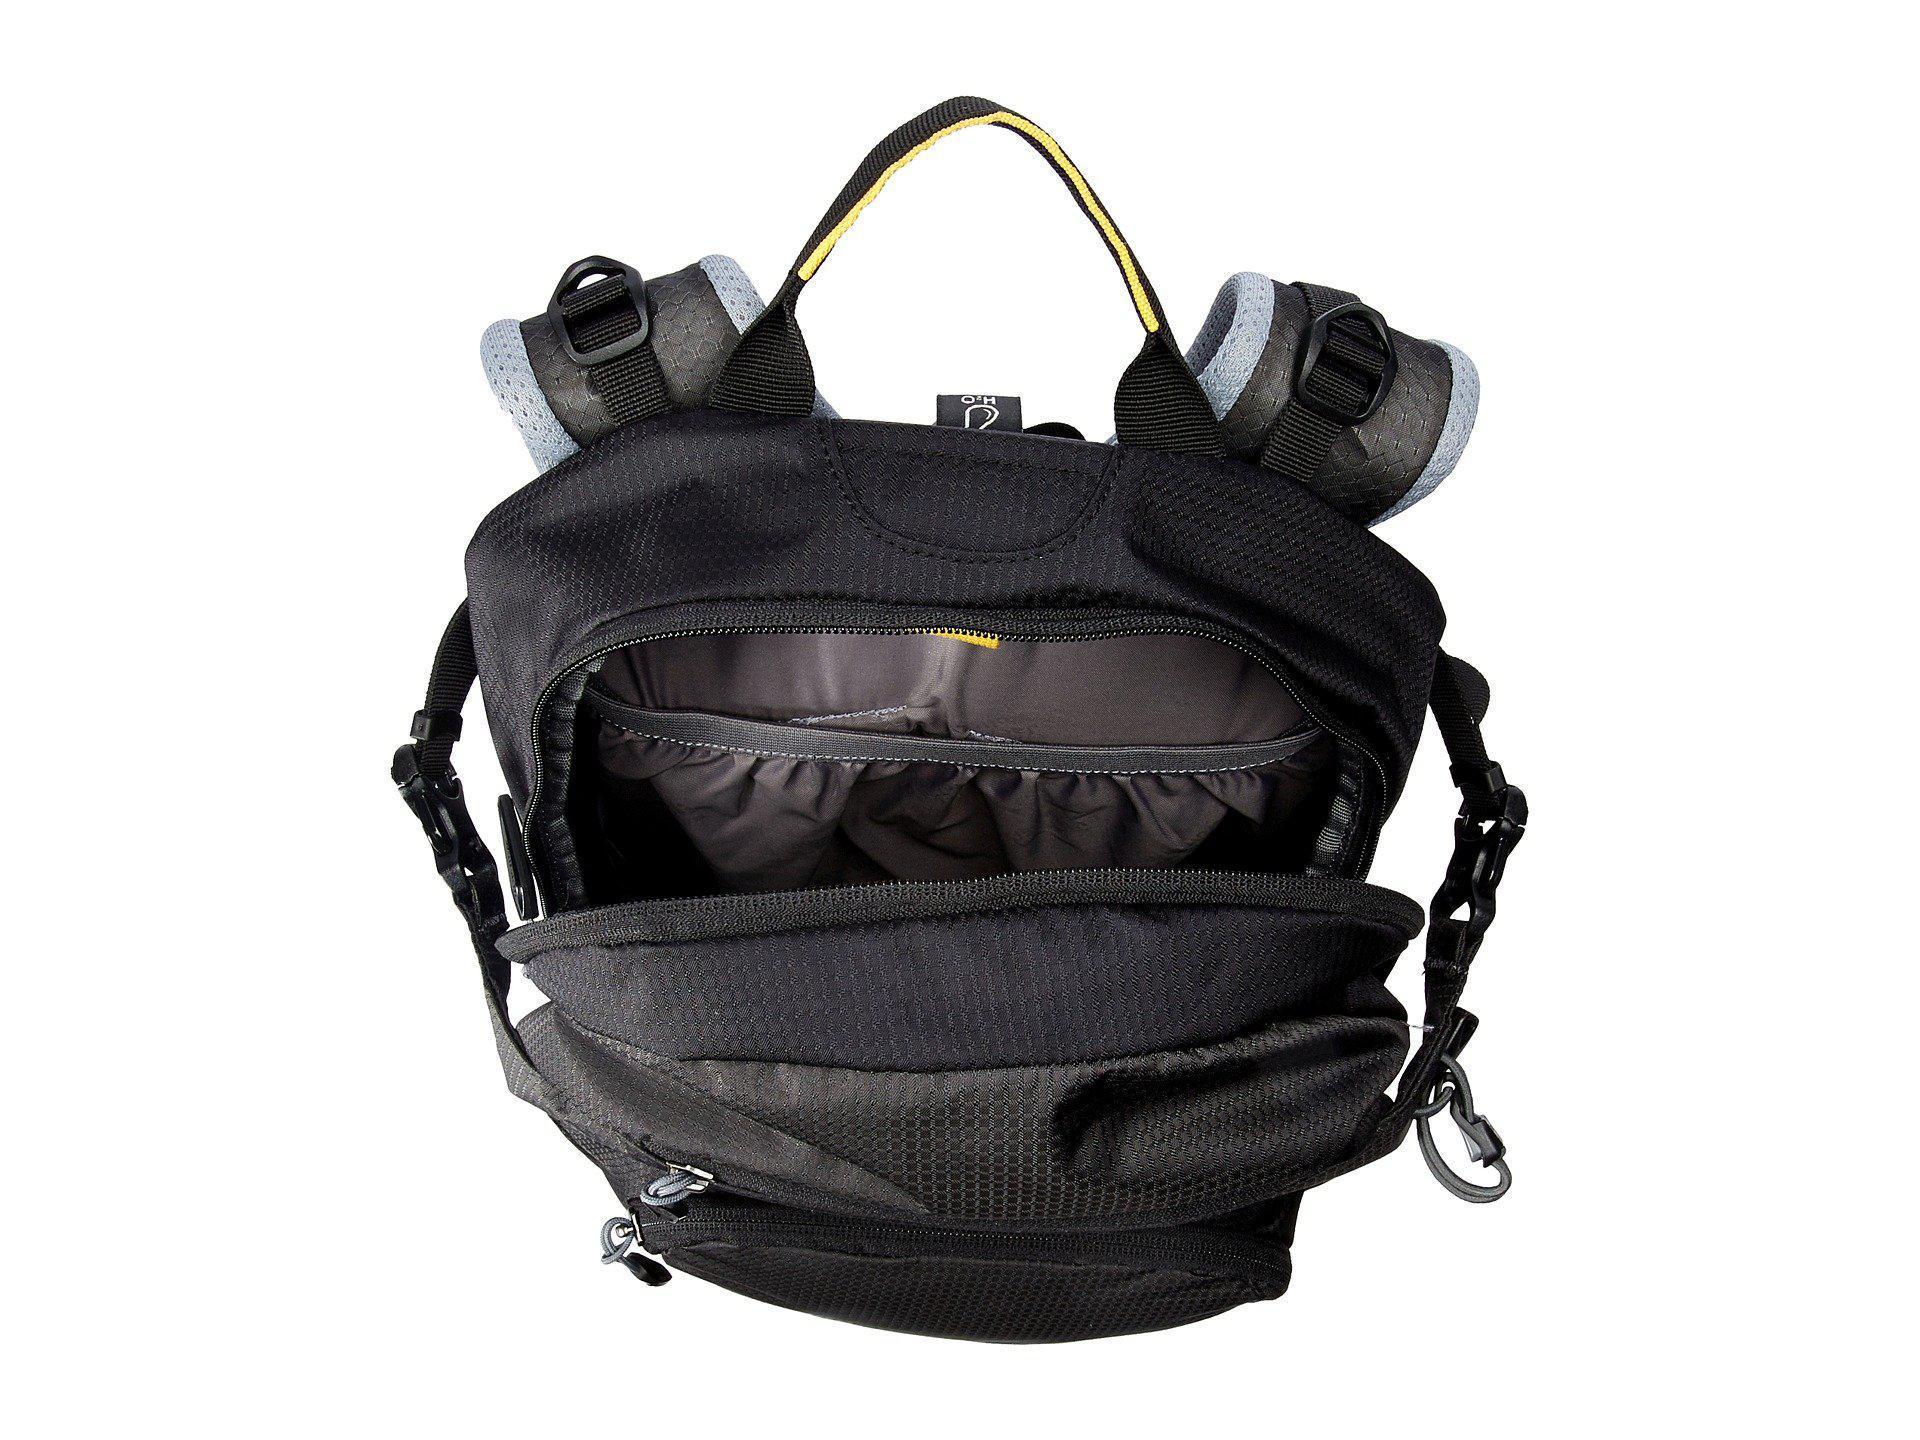 aa6d3f39b7 Jack Wolfskin Satellite 24 Pack (poseidon Blue) Backpack Bags in ...